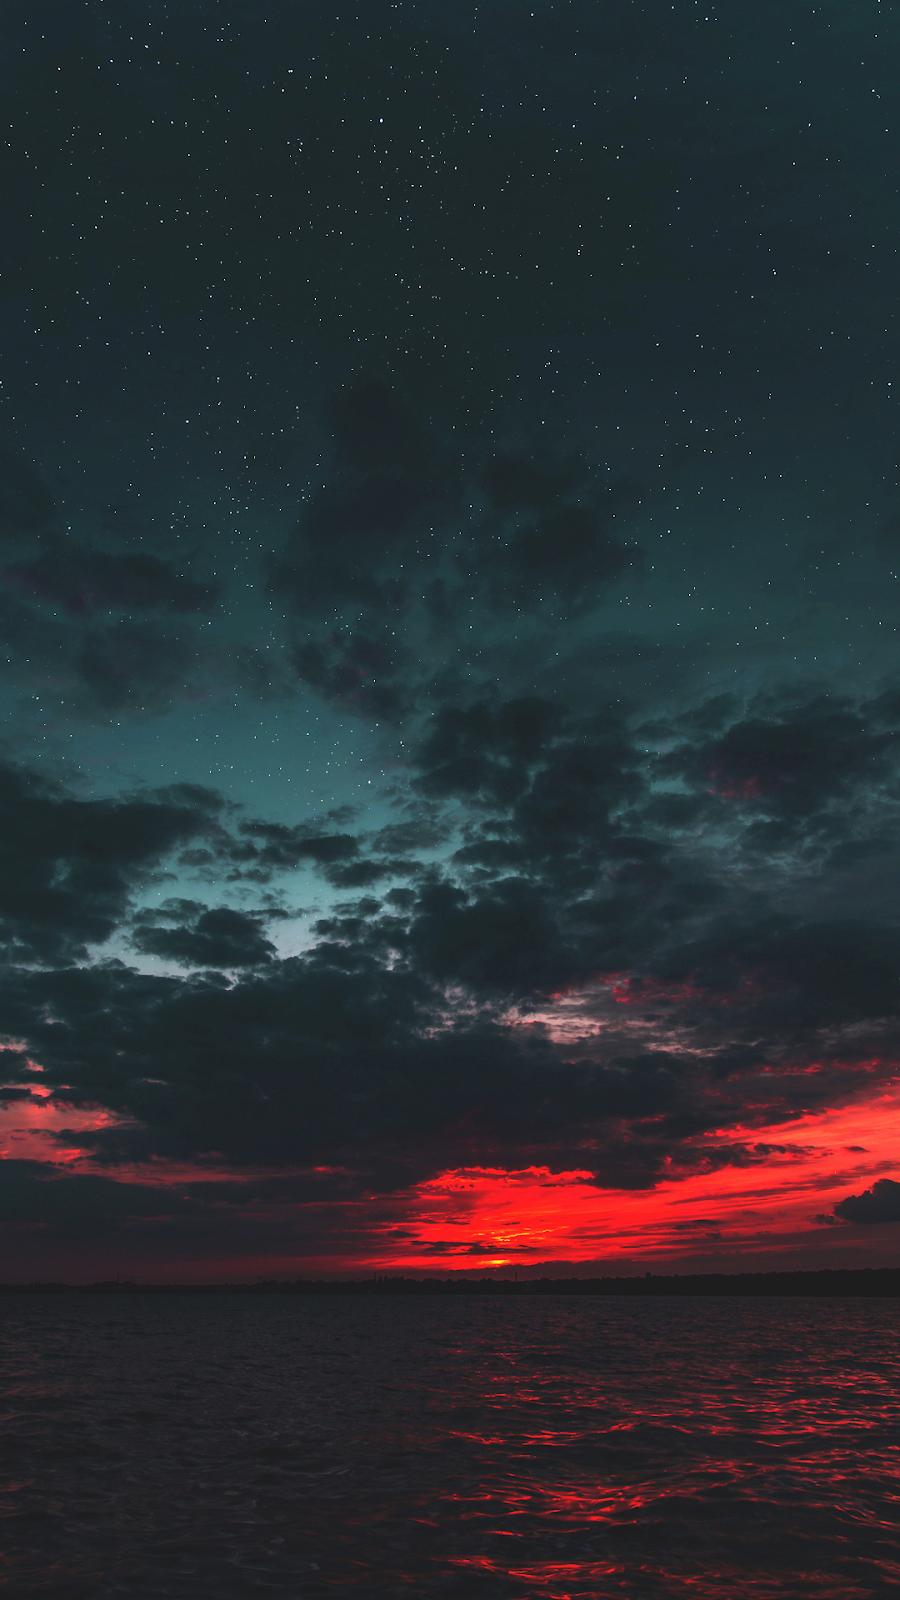 Wallpaper art akiobako girl nature sunset sky clouds stars